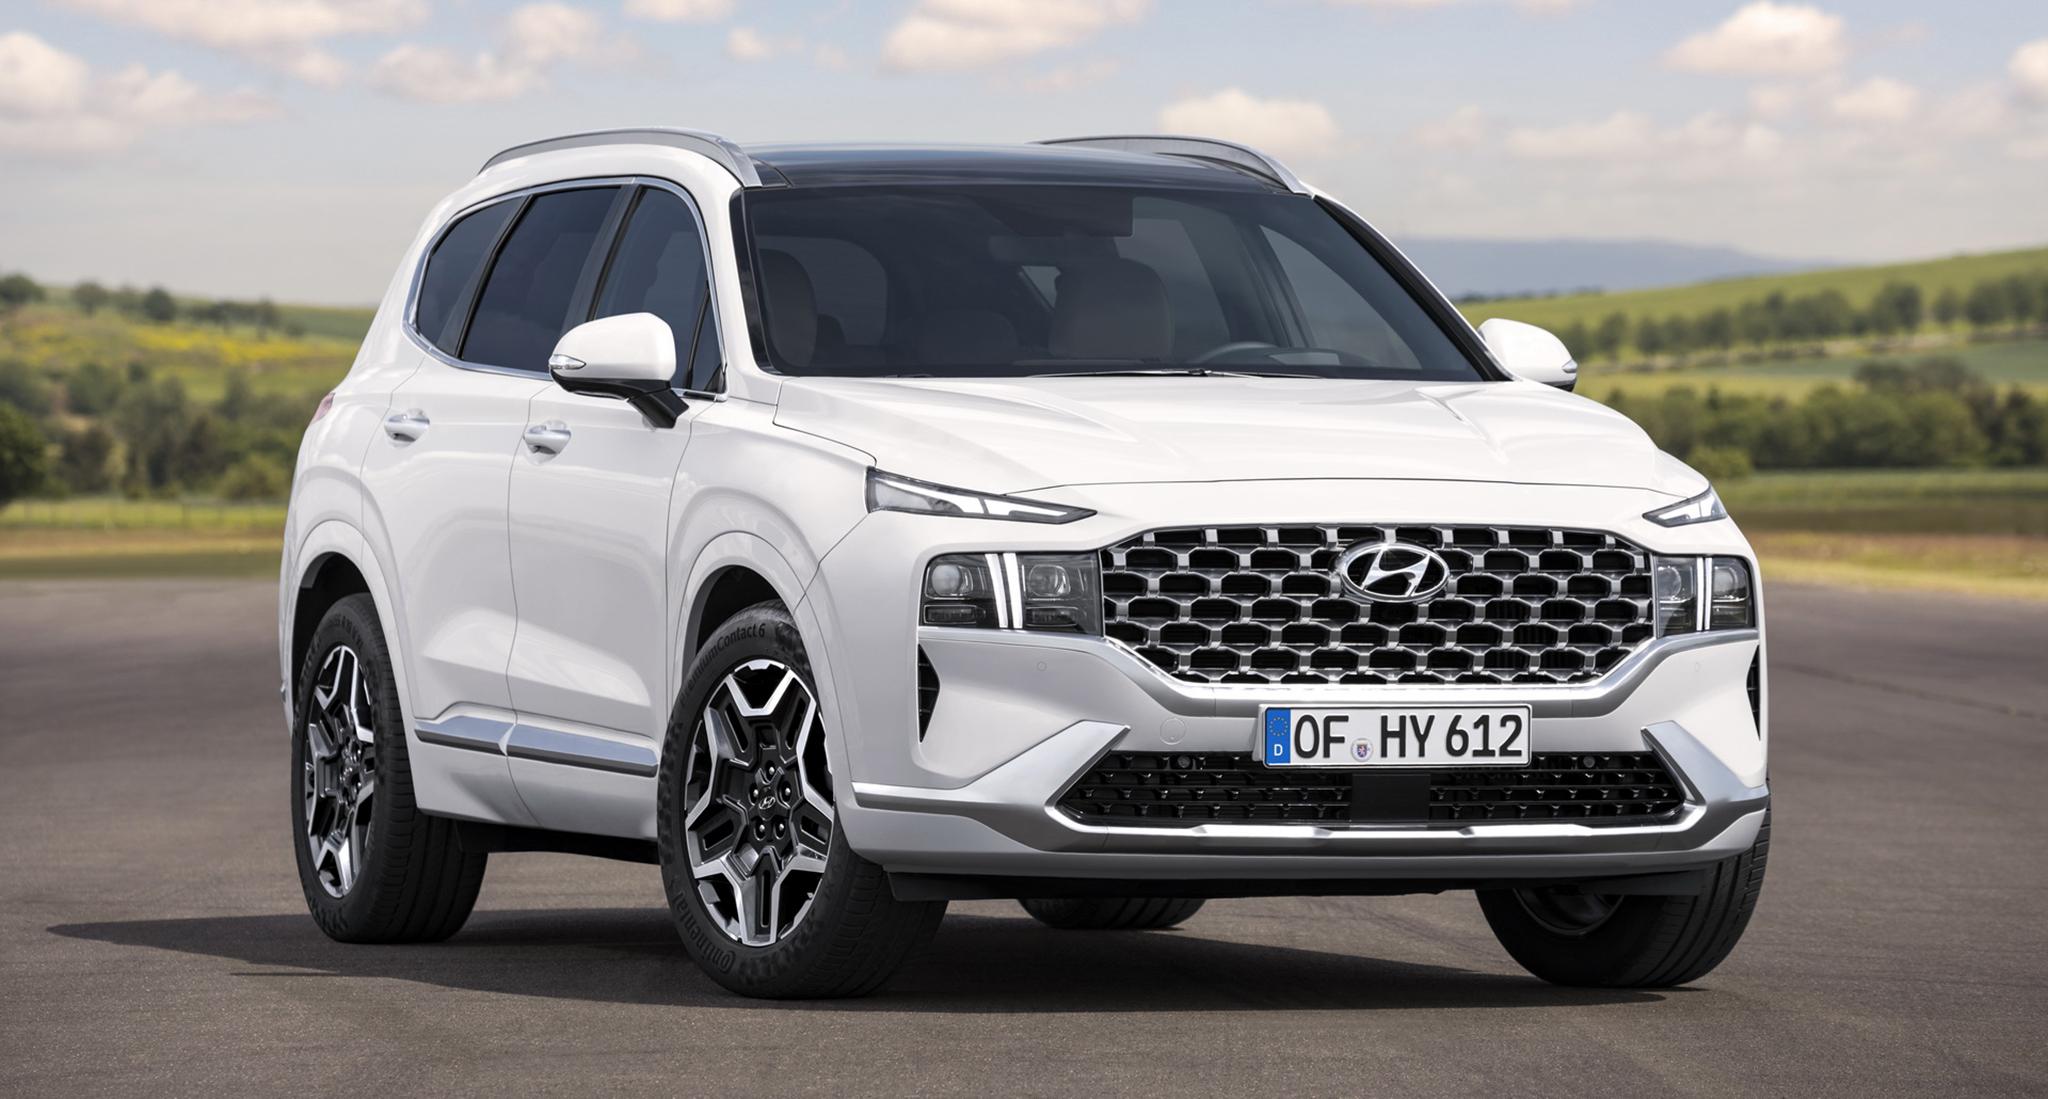 Hyundai Santa Fe 2021 chính thức lộ diện